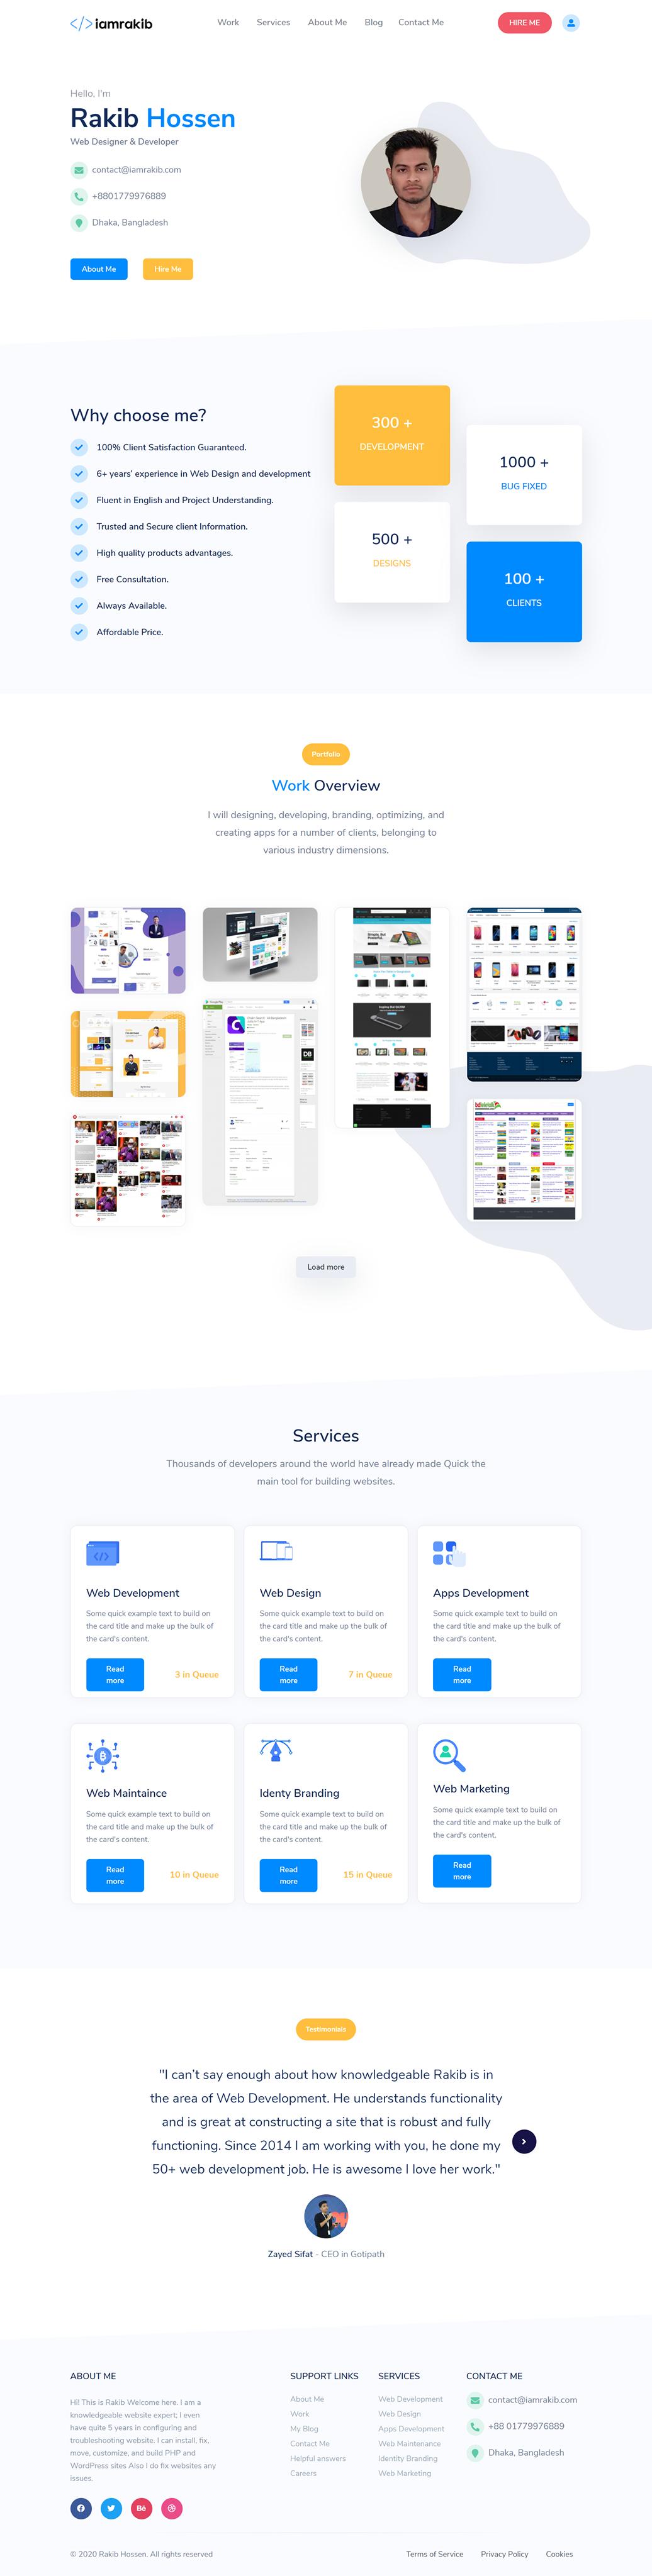 bootstrap freelancer portfolio rakib hossen ui design web developer portfolio Website UI design